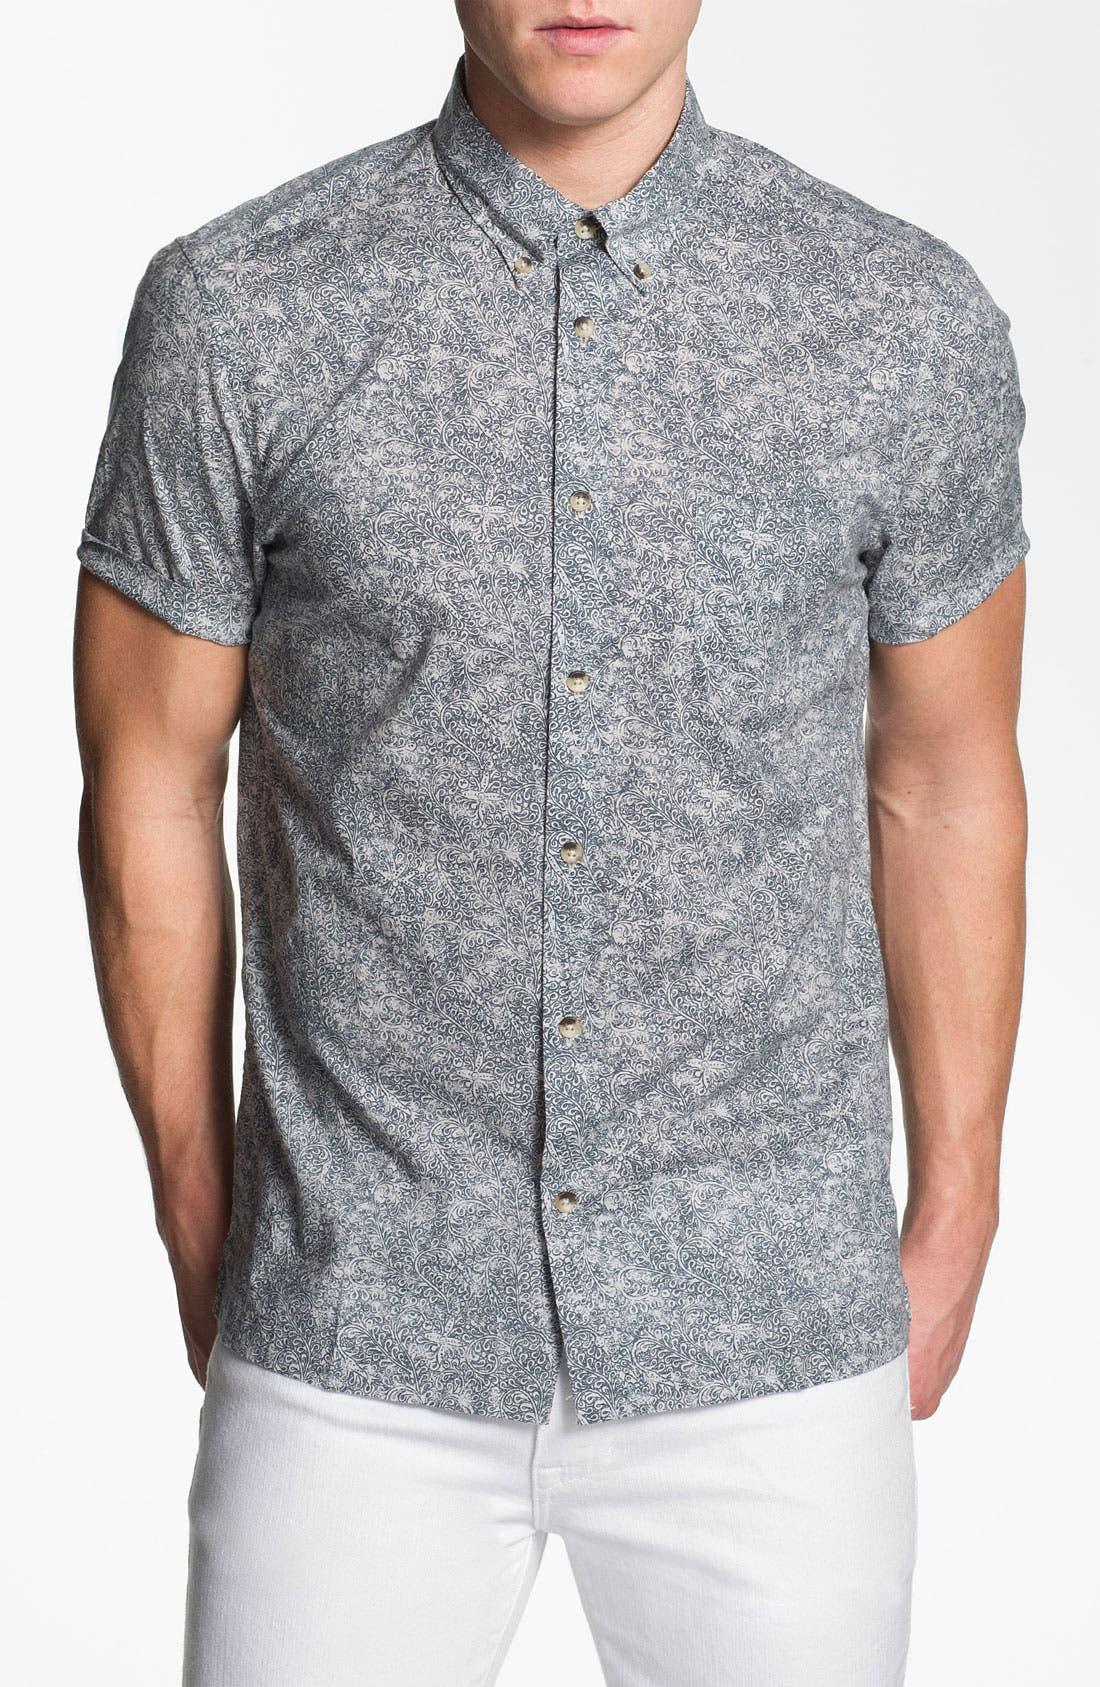 Alternate Image 1 Selected - PLECTRUM by Ben Sherman Print Woven Shirt